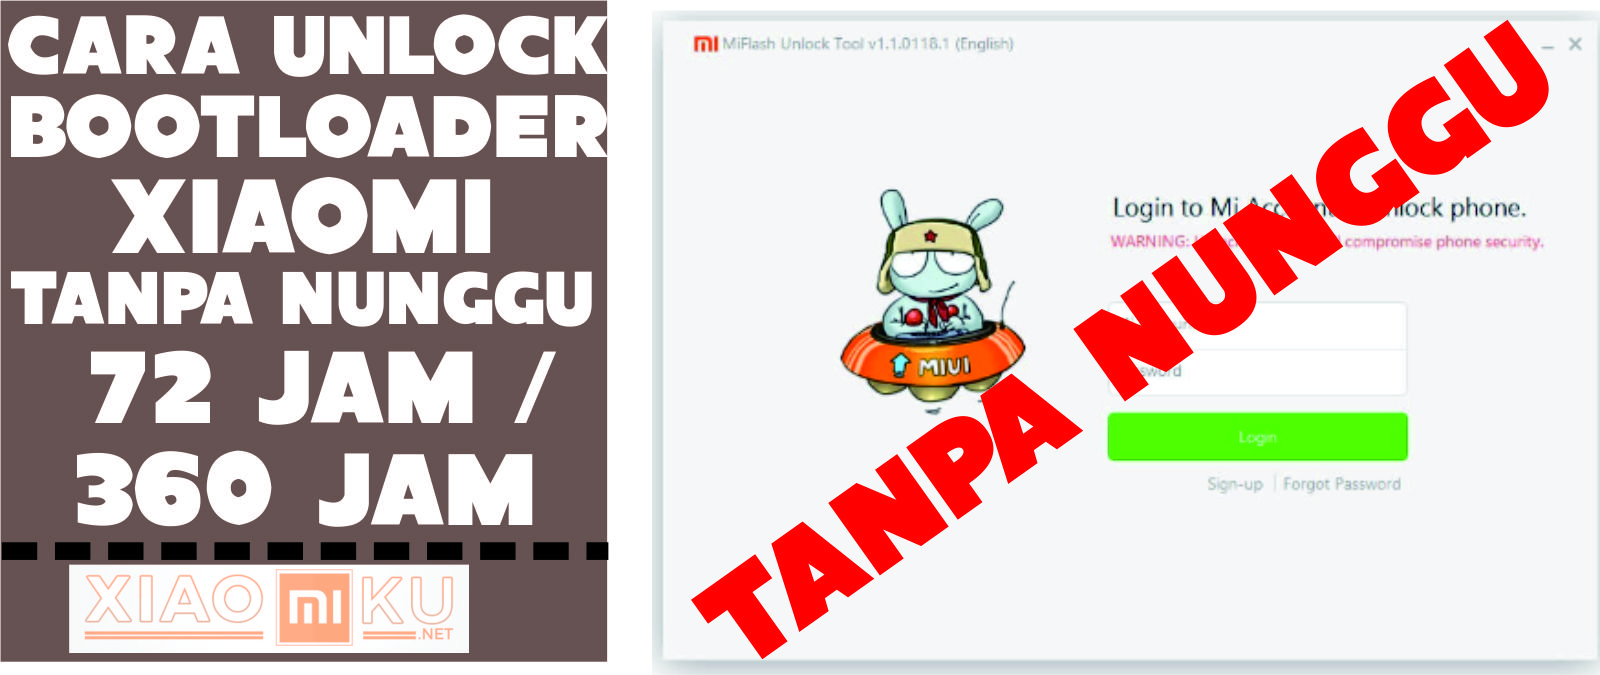 Cara Unlock Bootloader Xiaomi Tanpa Menunggu 72 Jam / 360 Jam - Miuiku